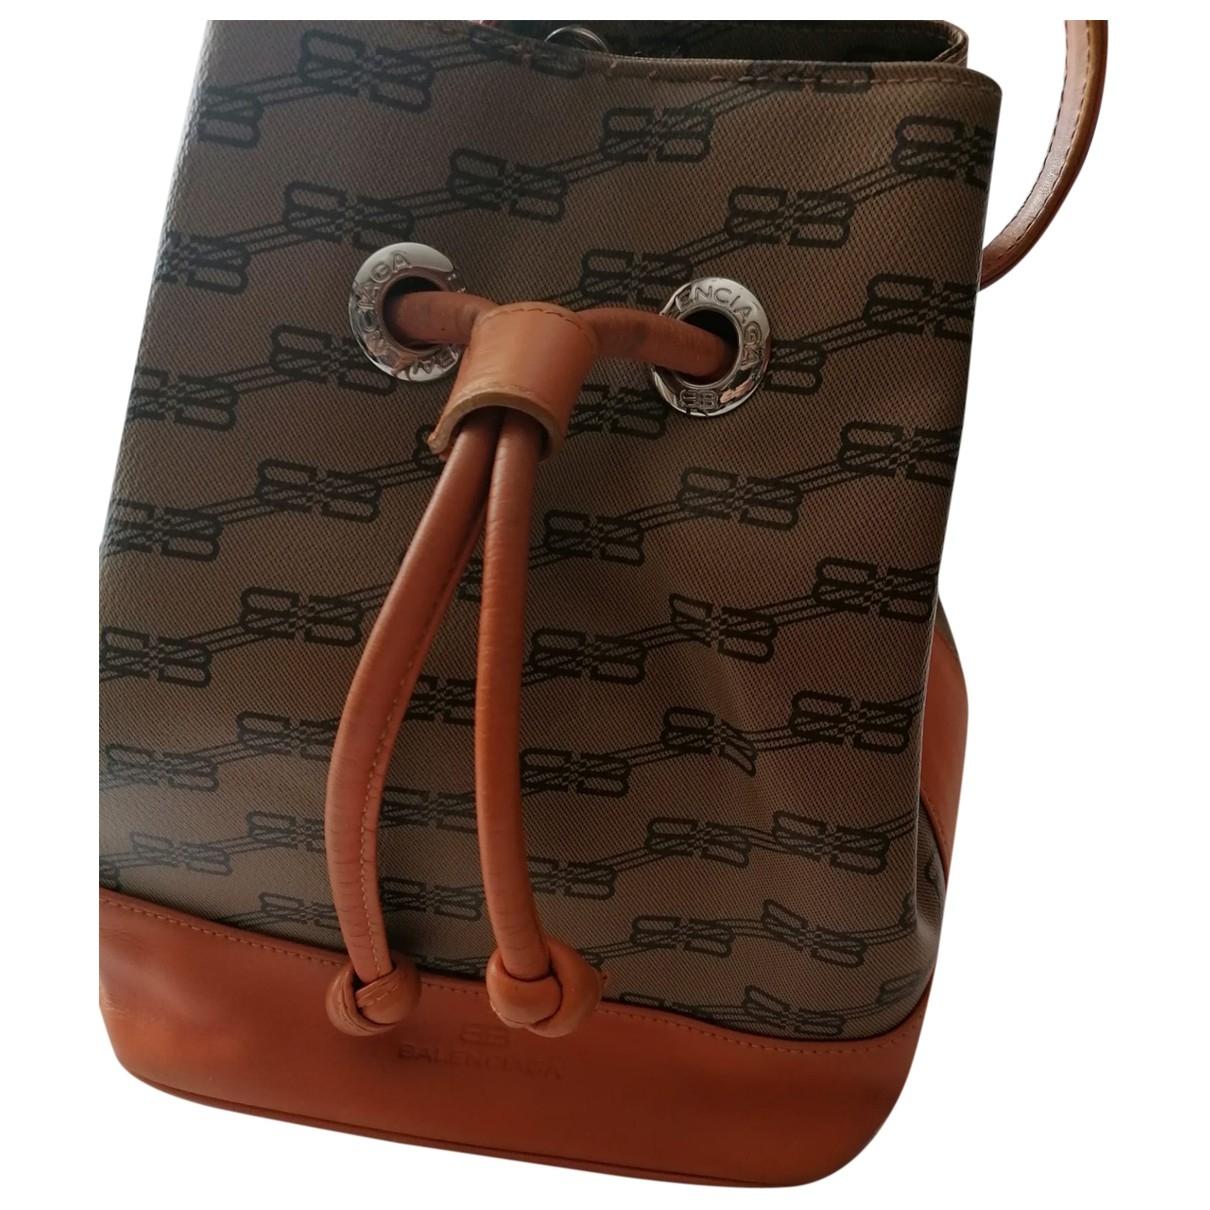 Balenciaga \N Multicolour Leather handbag for Women \N